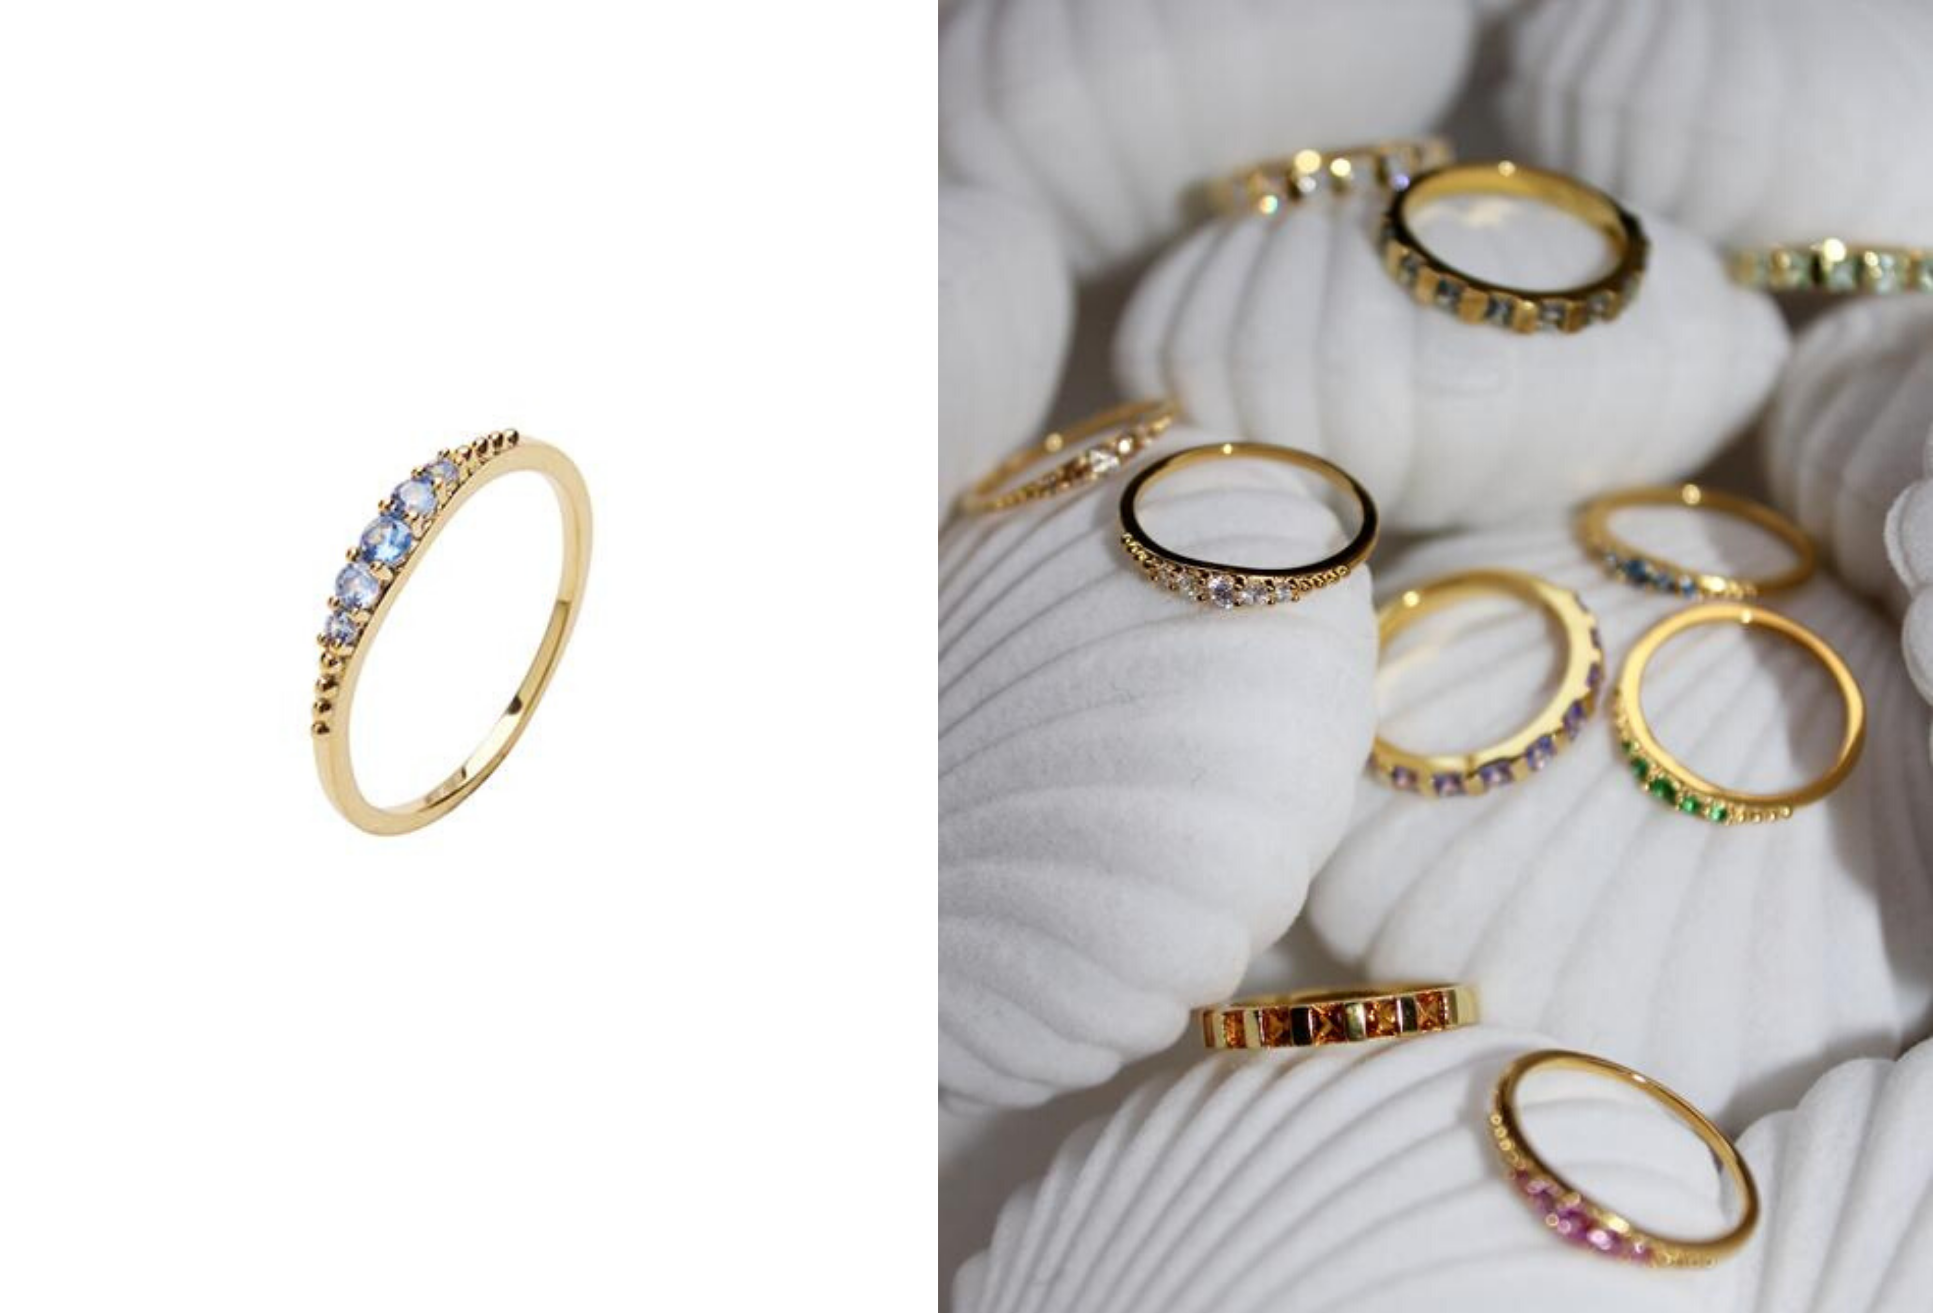 Pico ring, Pico, ring med sten, ring med blå sten, guldring. (Foto: Pico)